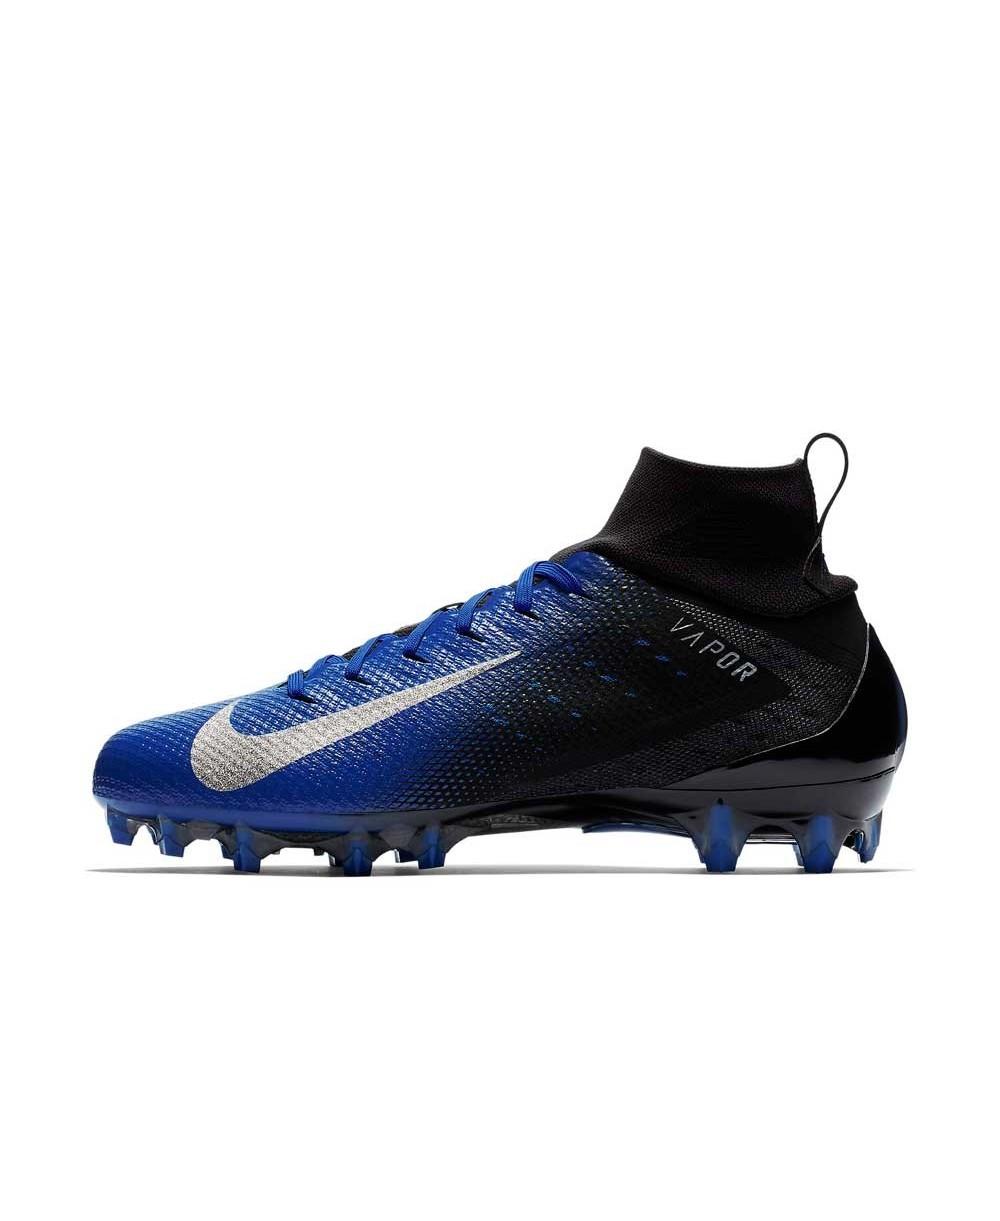 36e964a1286 Nike Men s Vapor Untouchable 3 Pro American Football Cleats Game Royal